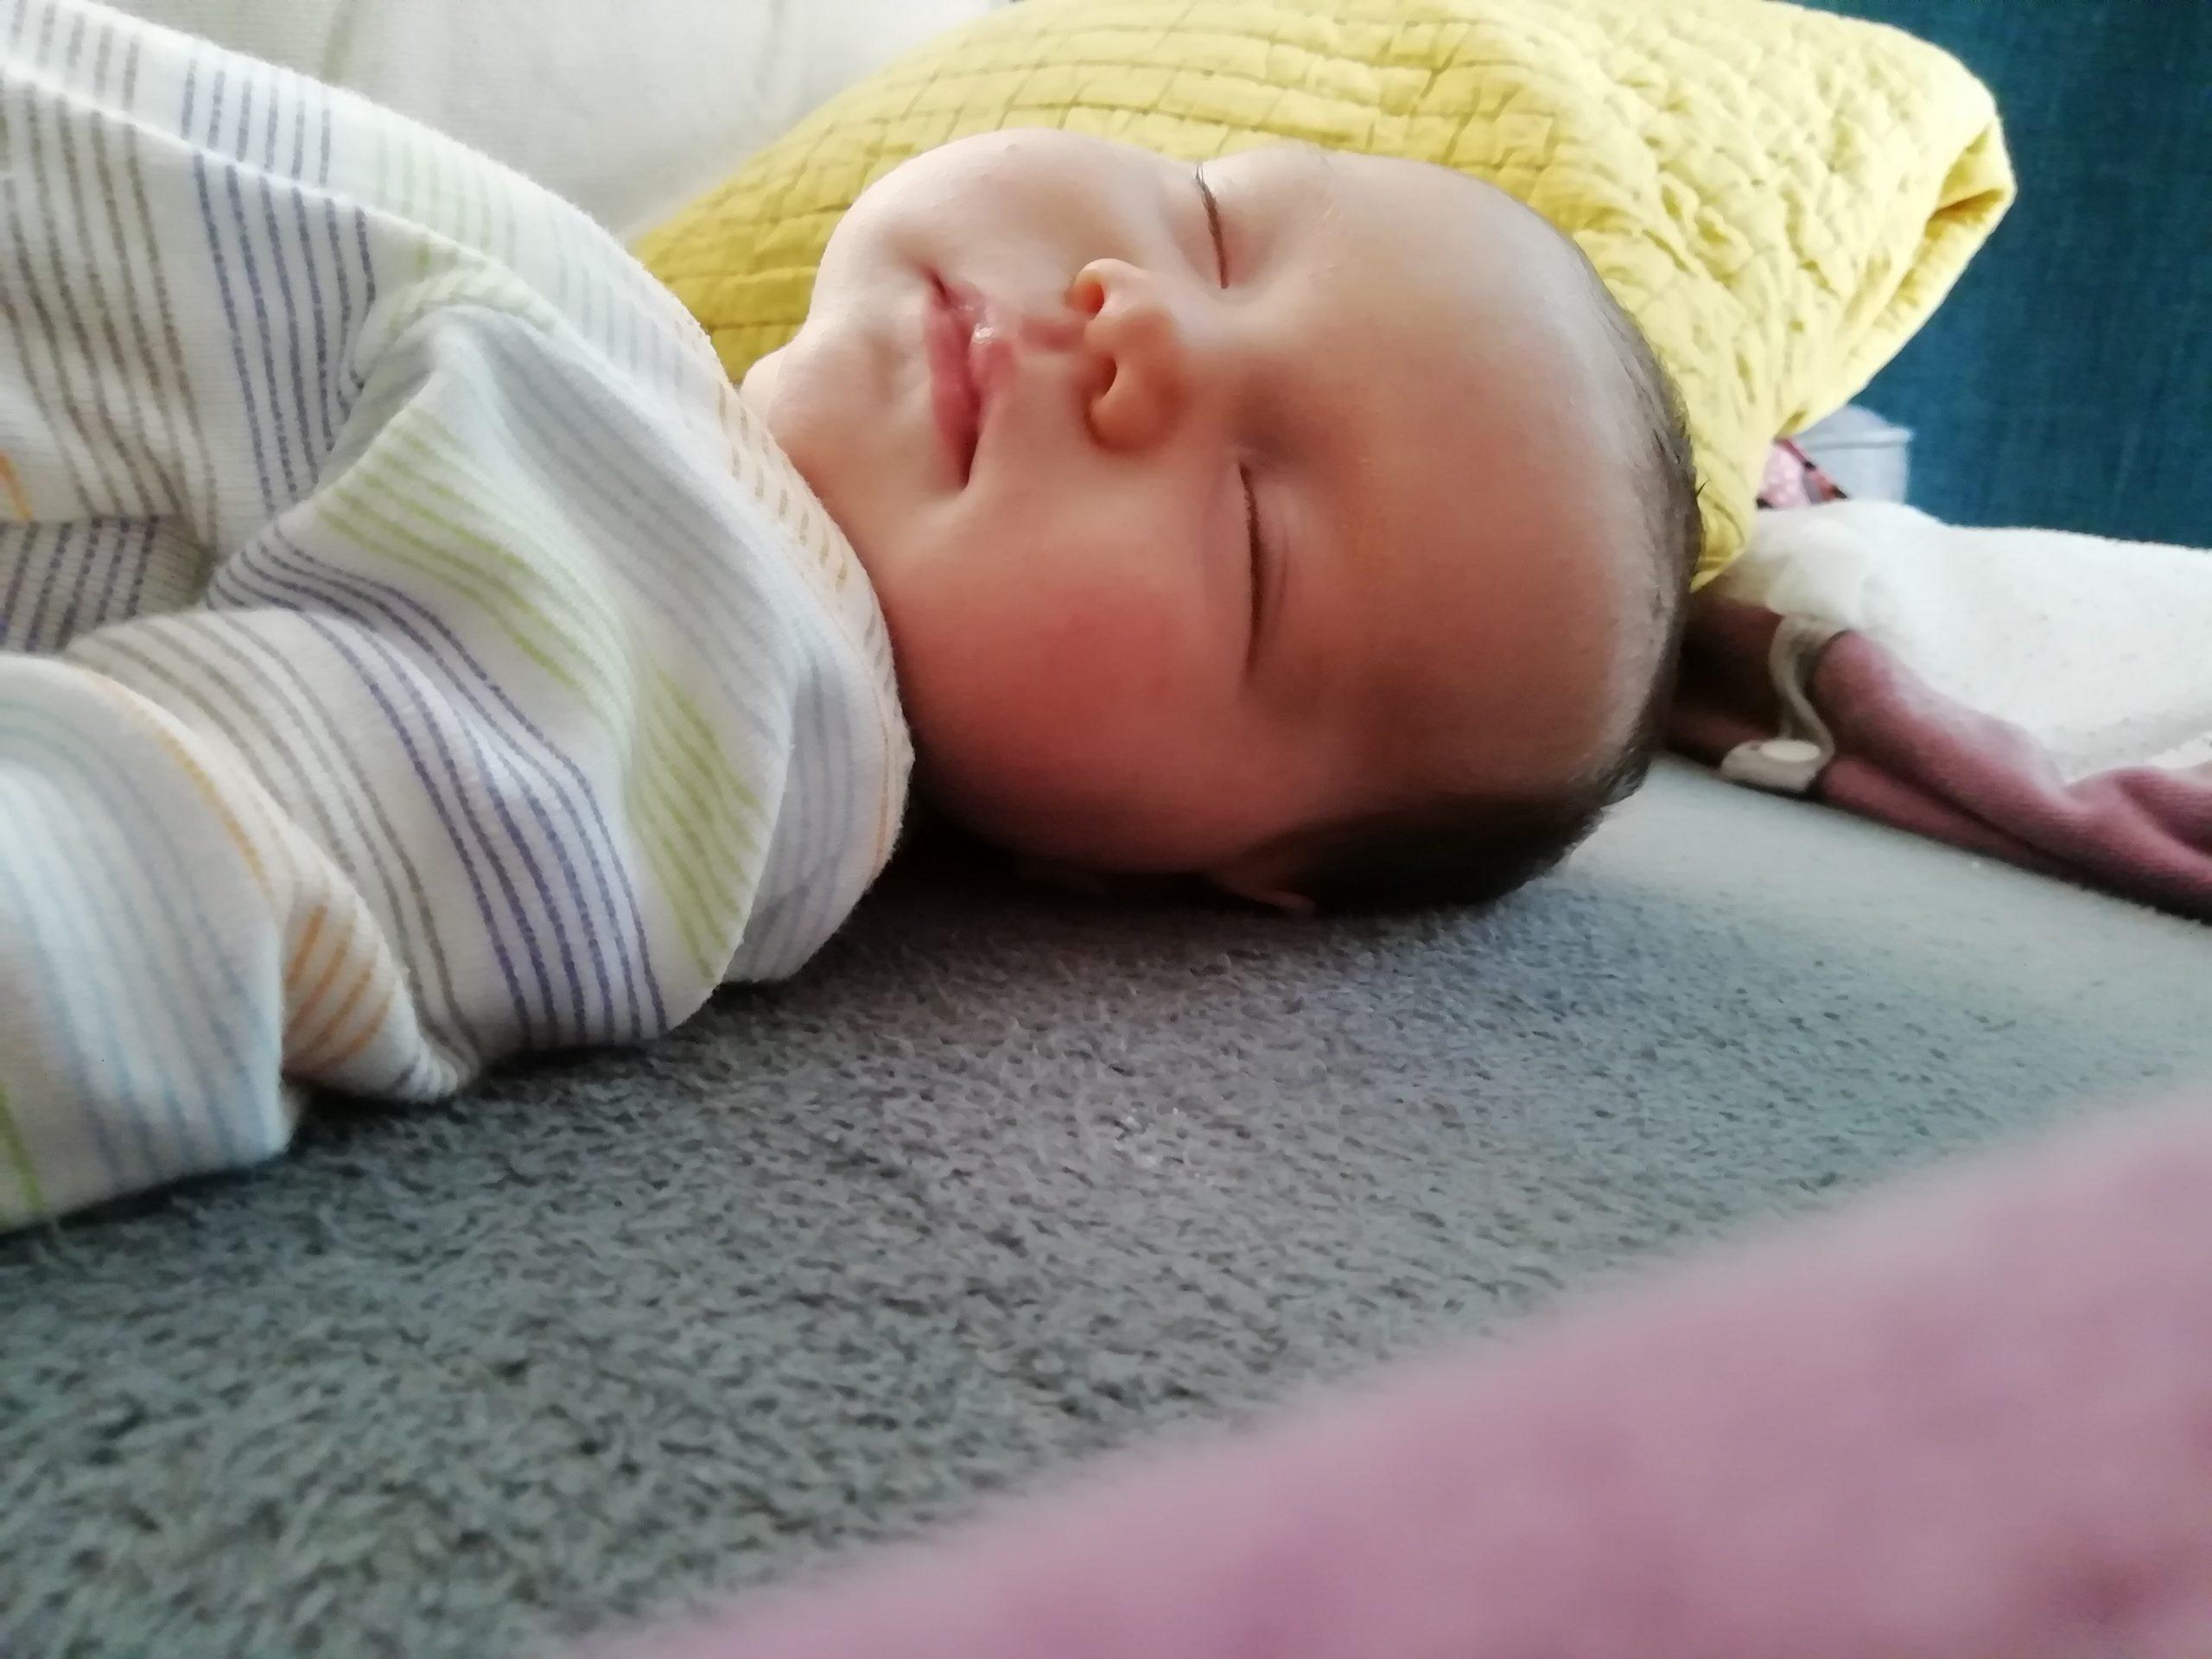 bébé dort sommeil enfant